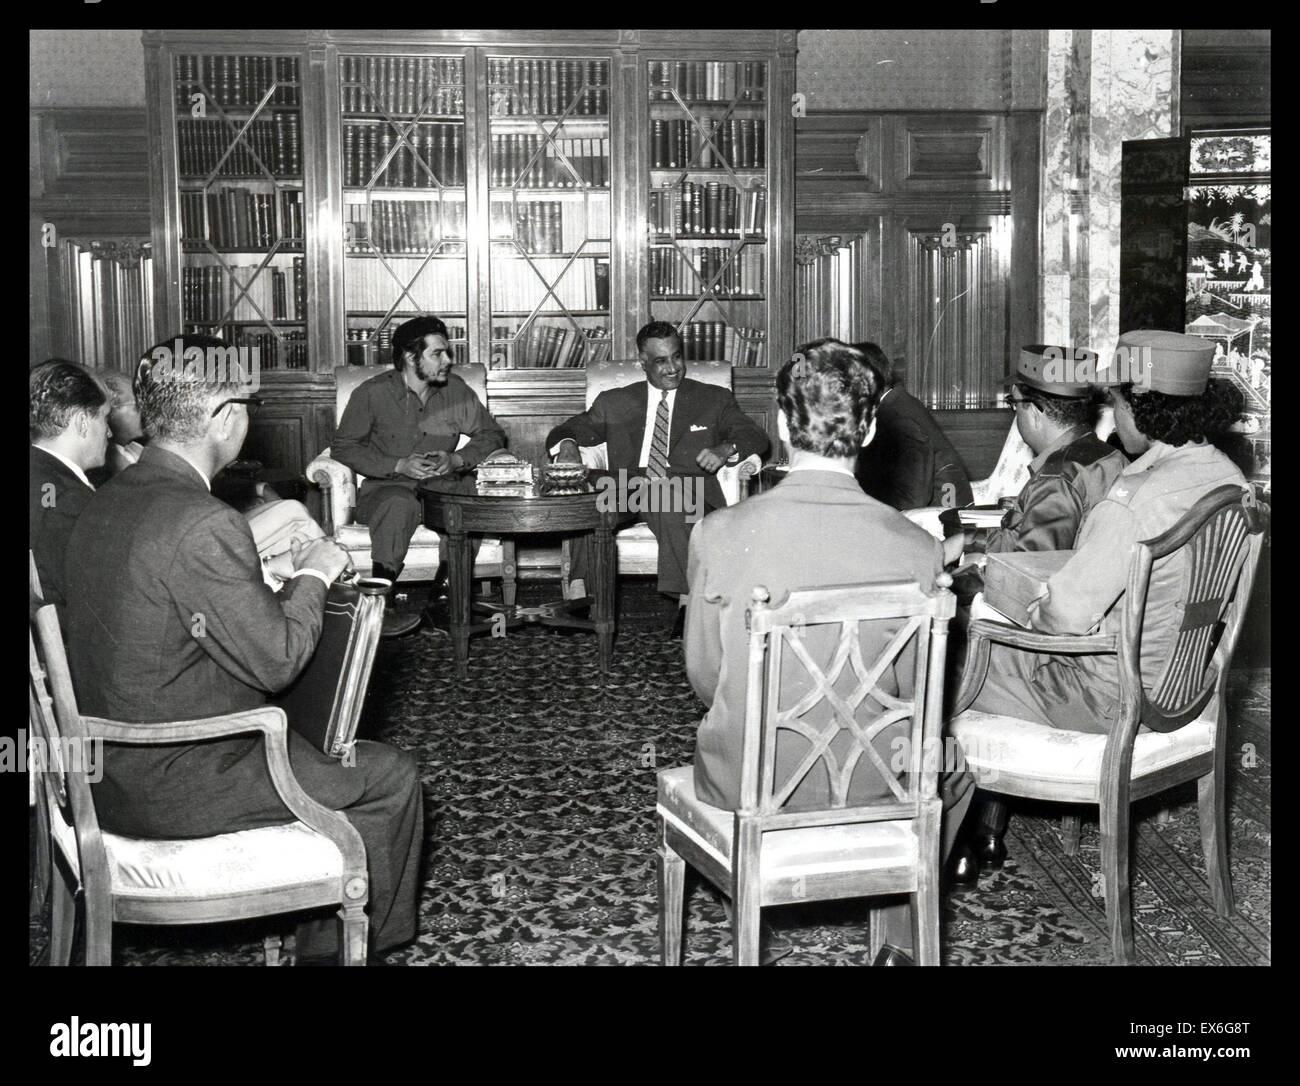 Cuban Revolutionary Ernesto Che Guevarra with Egypt's president Gamal Abdul Nasser in Cairo, 1959 - Stock Image